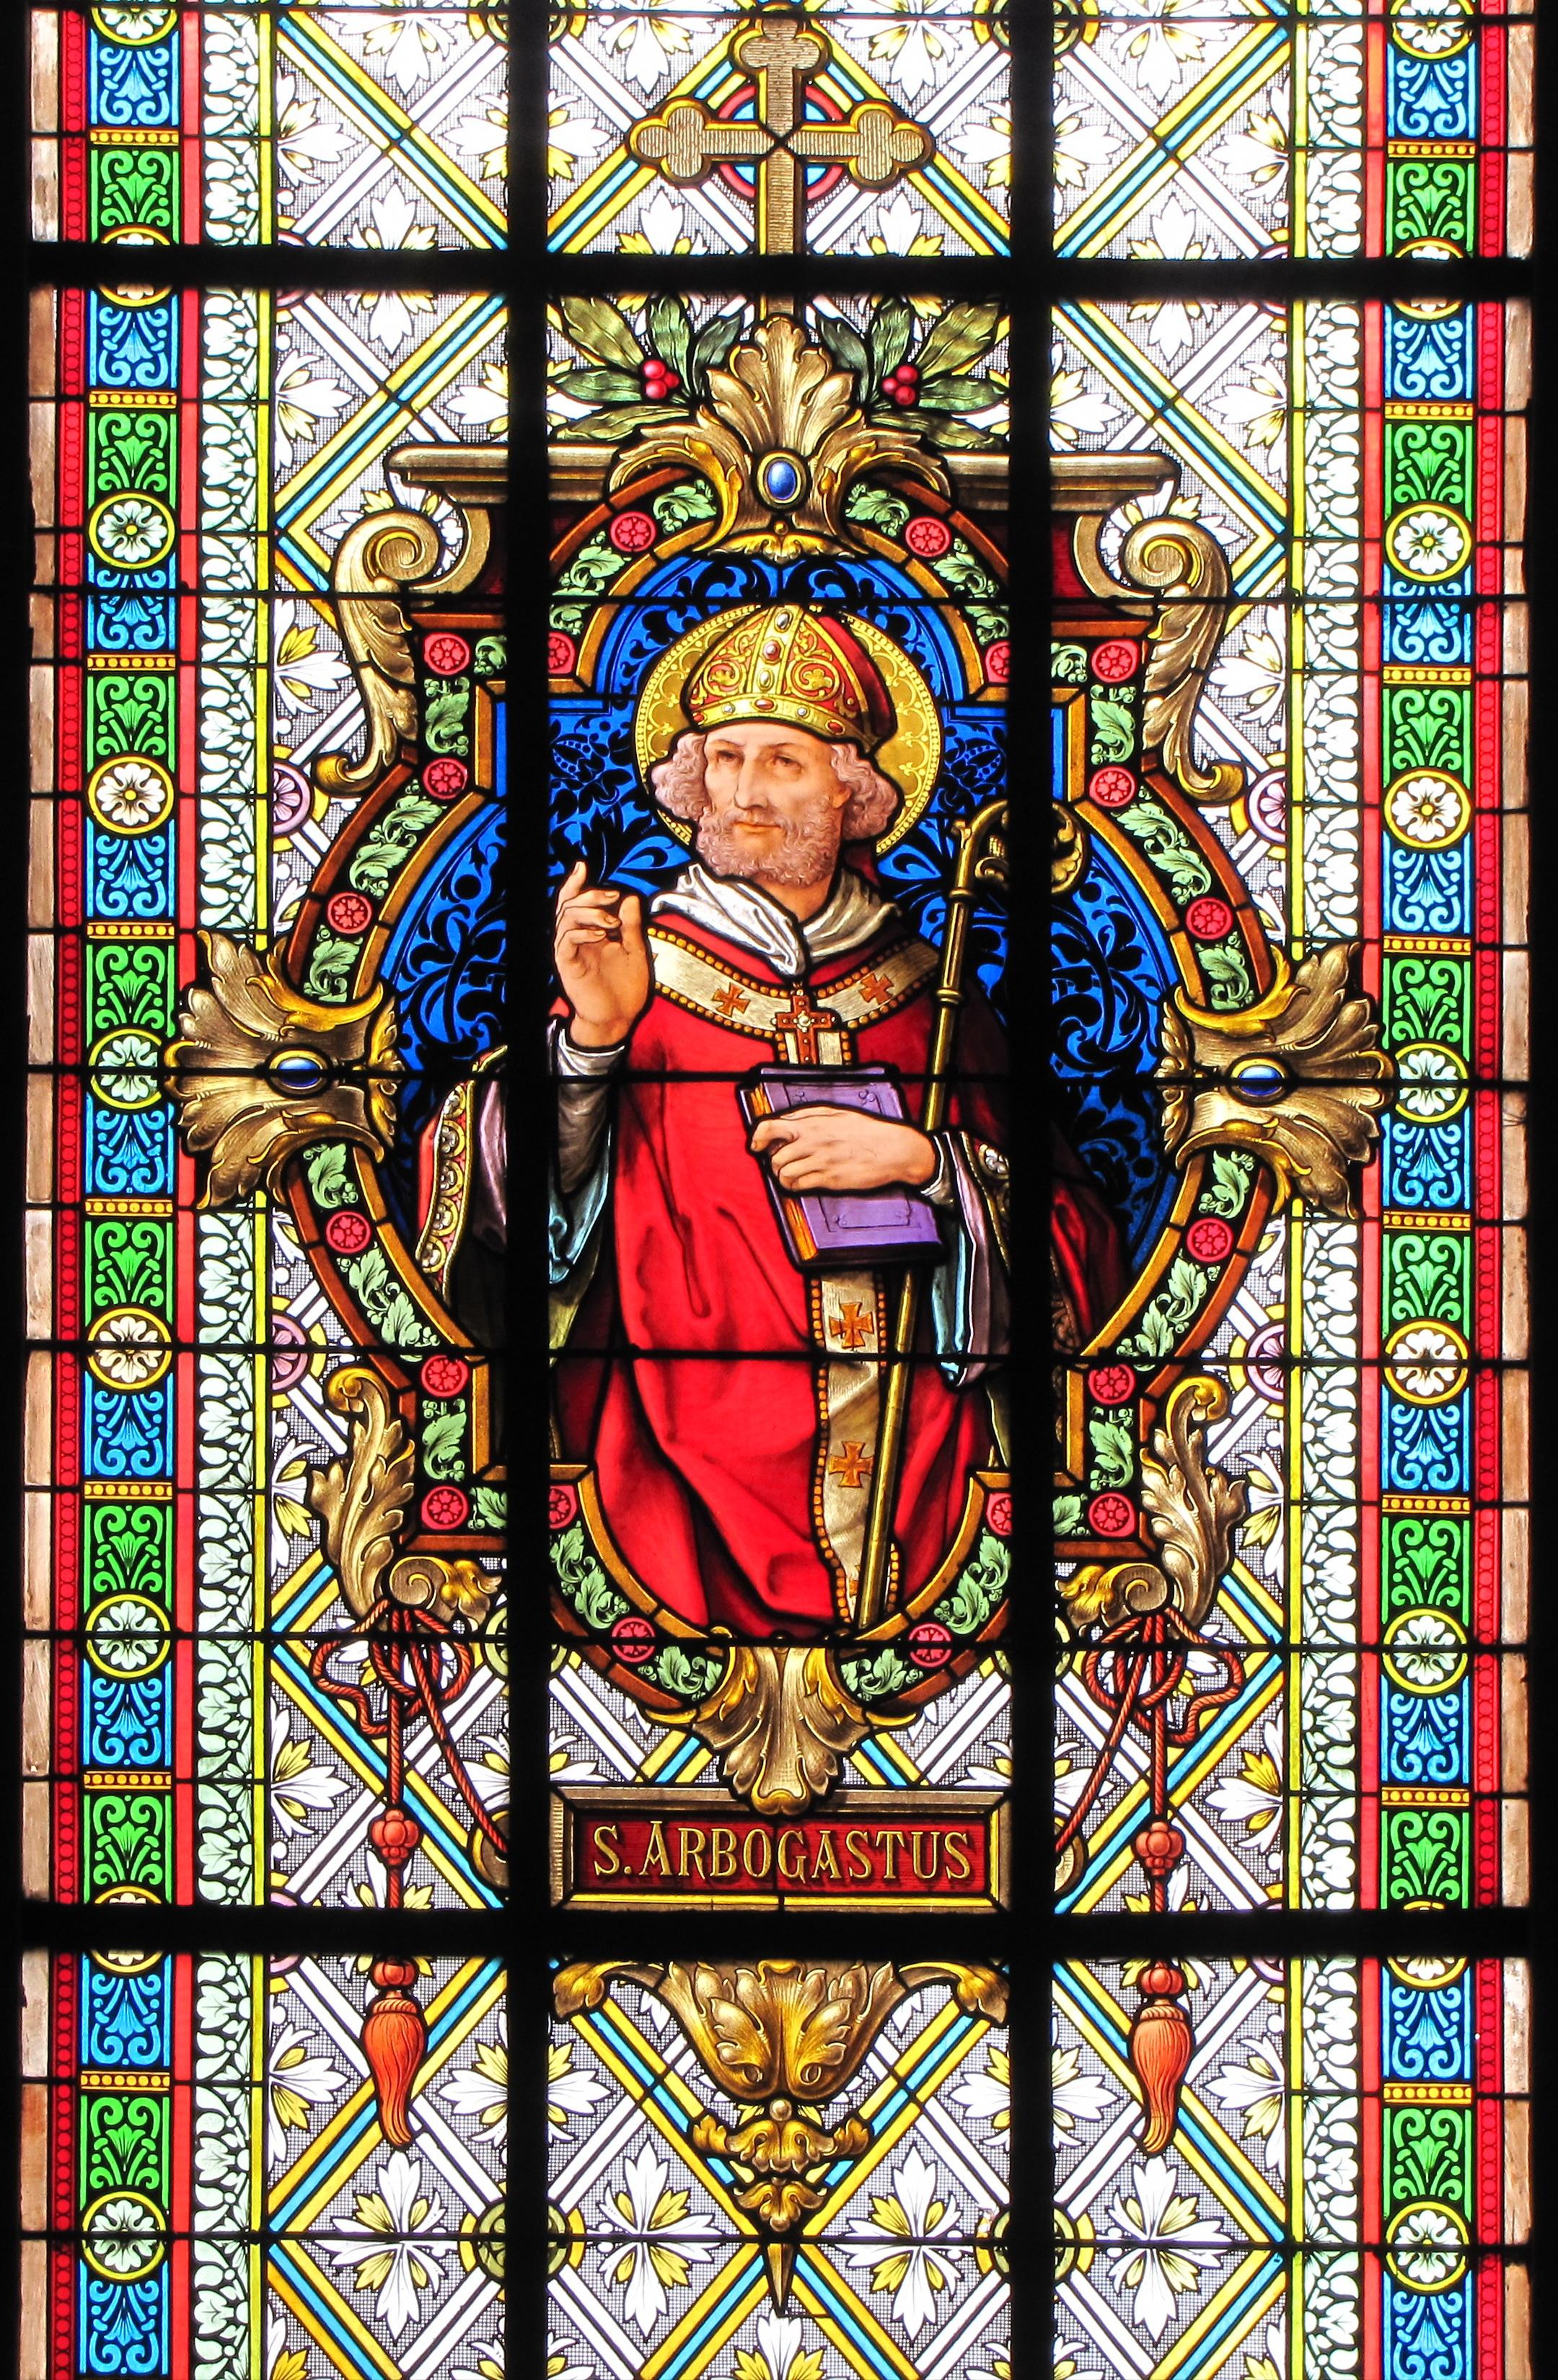 Glassmaleri av Arbogast fra kirken Saint-Médard i Bœrsch (ty. Börsch) i Bas-Rhin